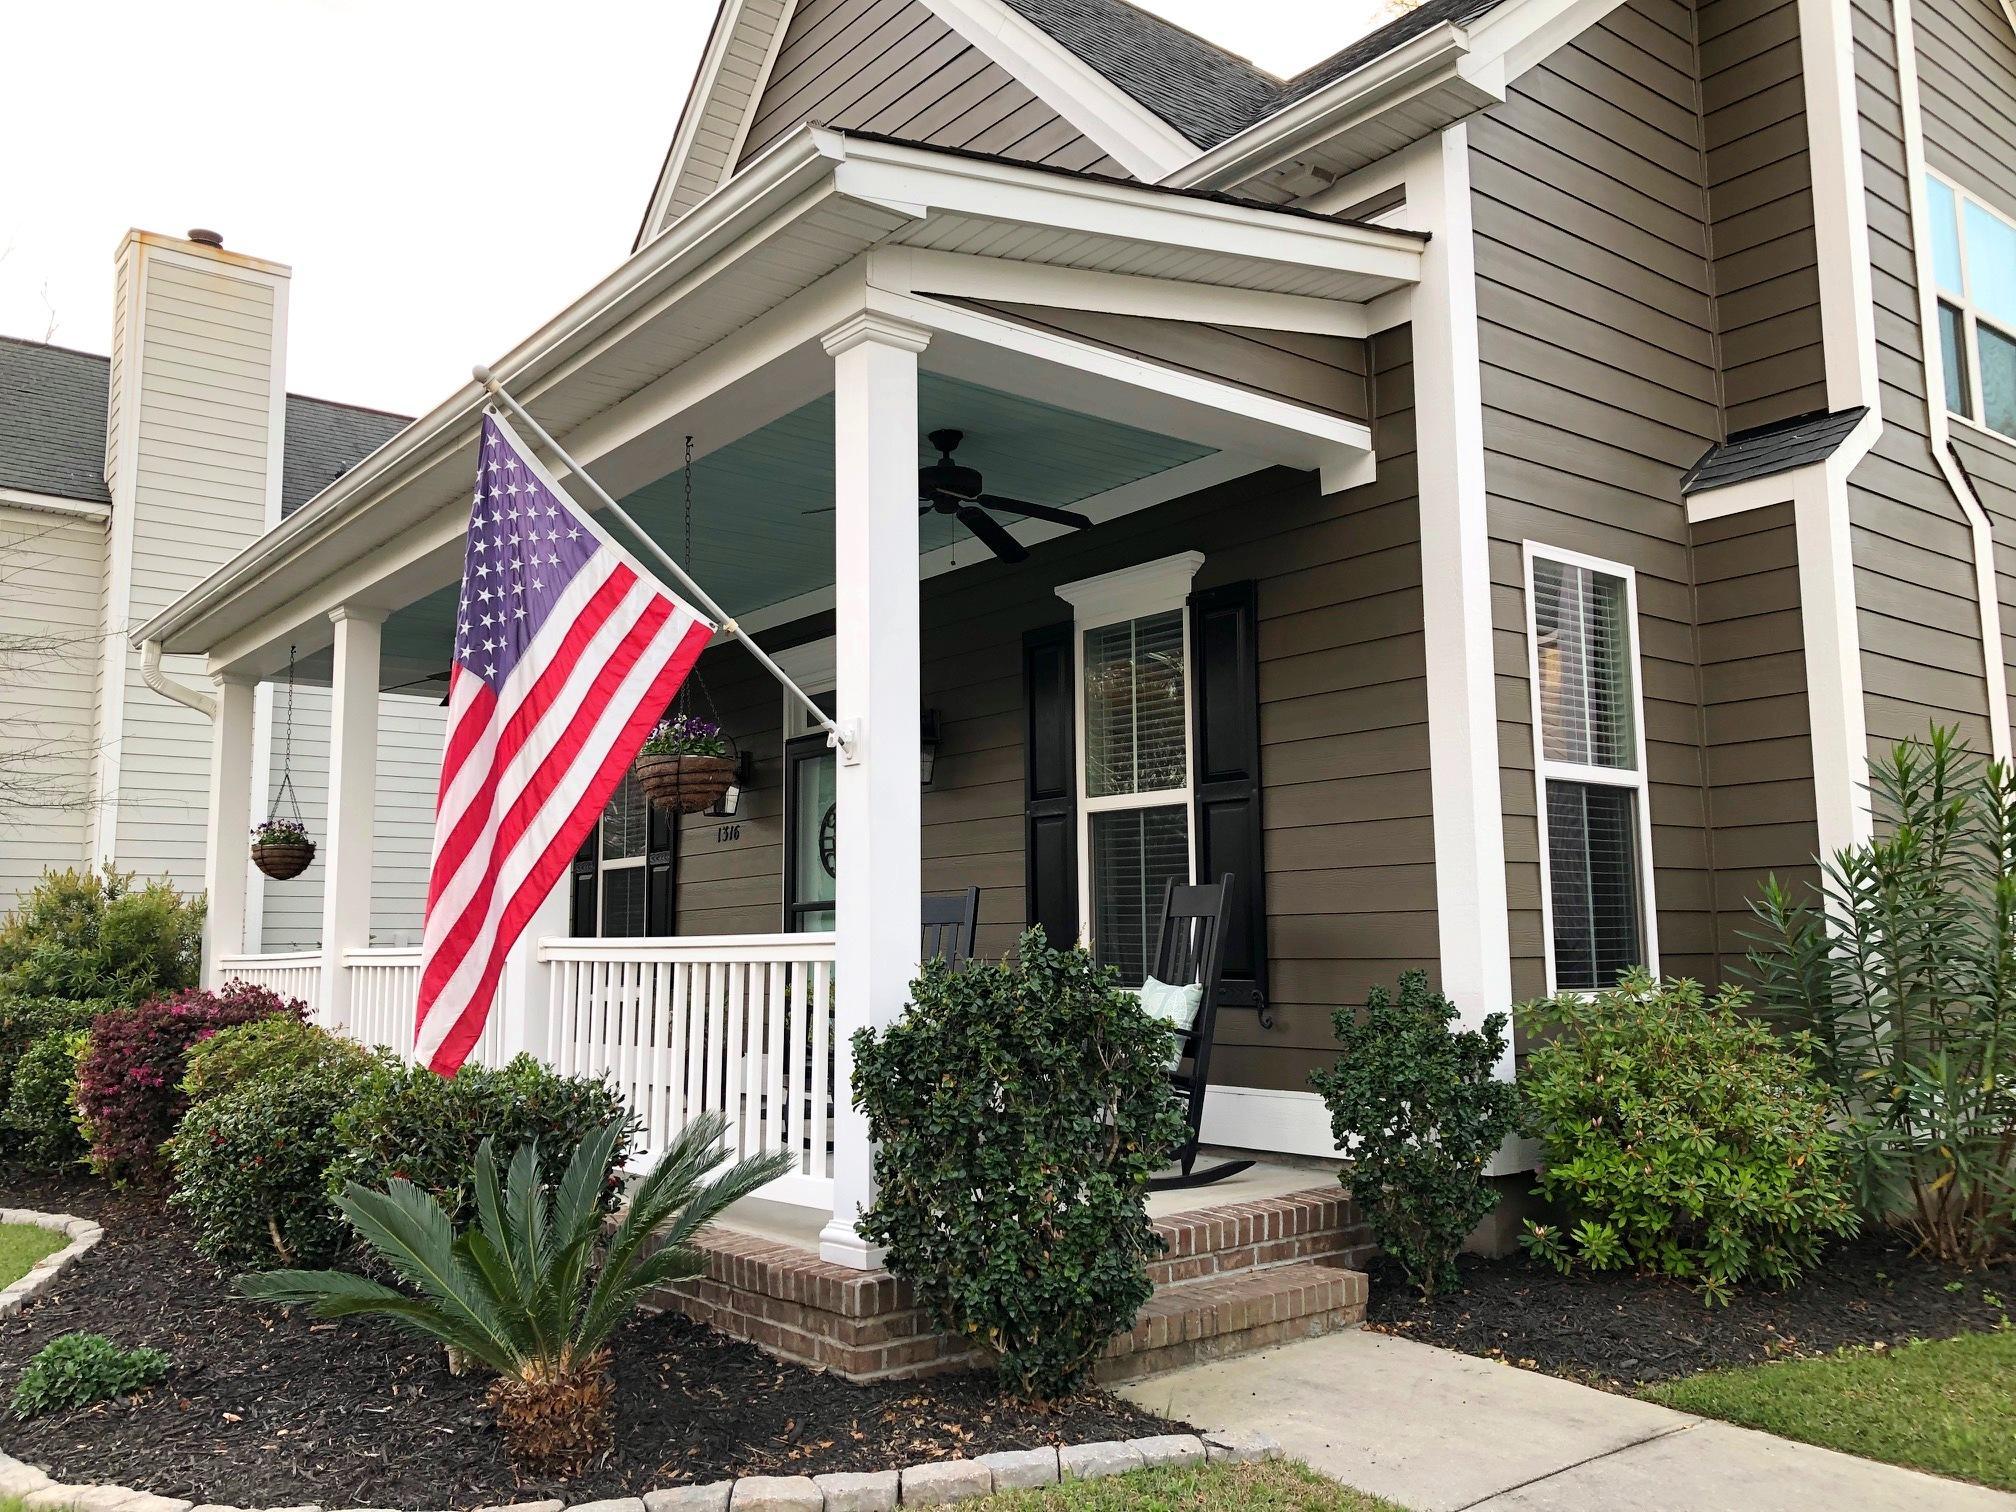 Carol Oaks Homes For Sale - 1316 Carol Oaks, Mount Pleasant, SC - 6